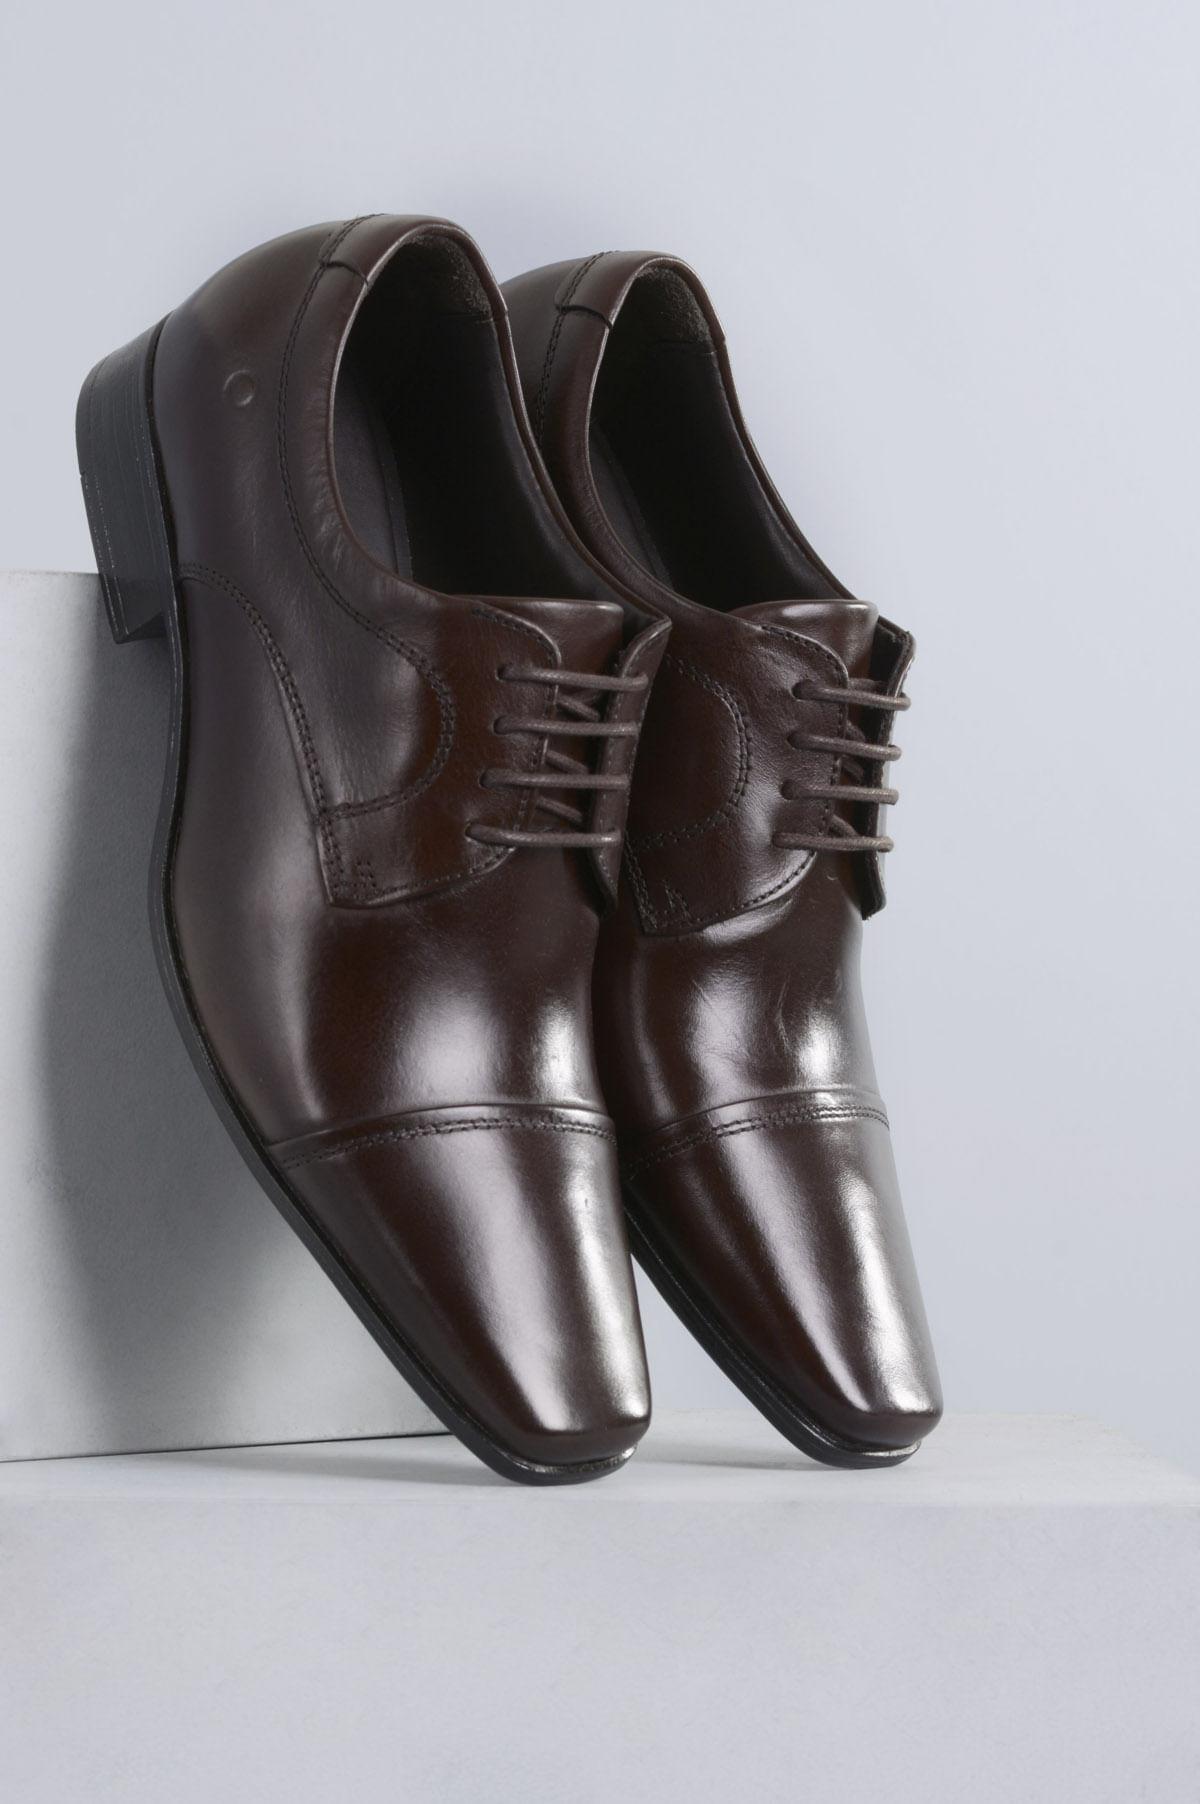 6d73f6c0564 Sapato Masculino Democrata Aspen CR TABACO - Mundial Calçados